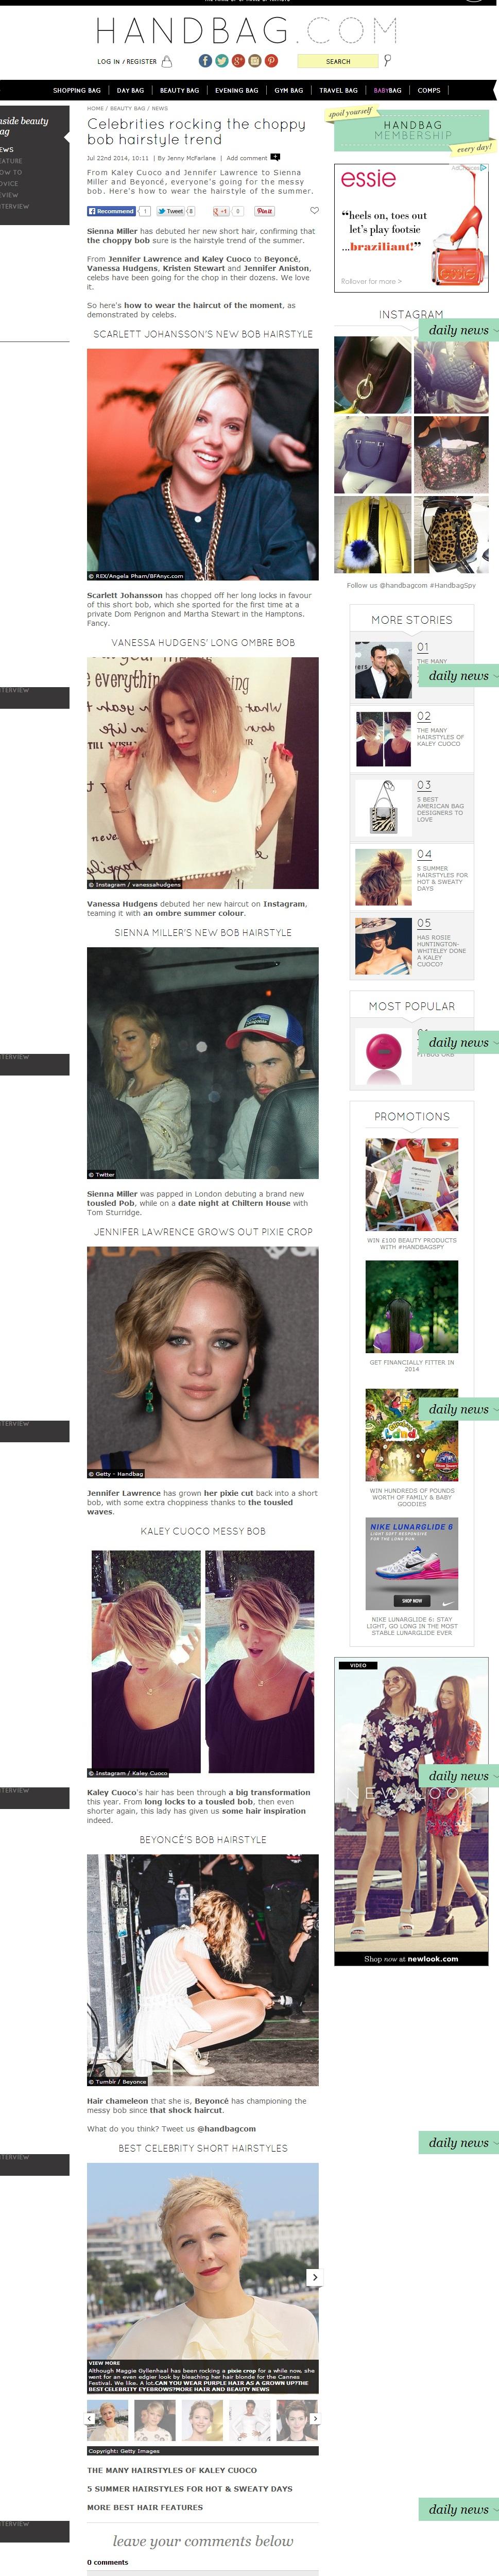 screencapture-www-handbag-com-beauty-bag-news-a582154-celebrities-rocking-the-choppy-bob-hairstyle-trend-html